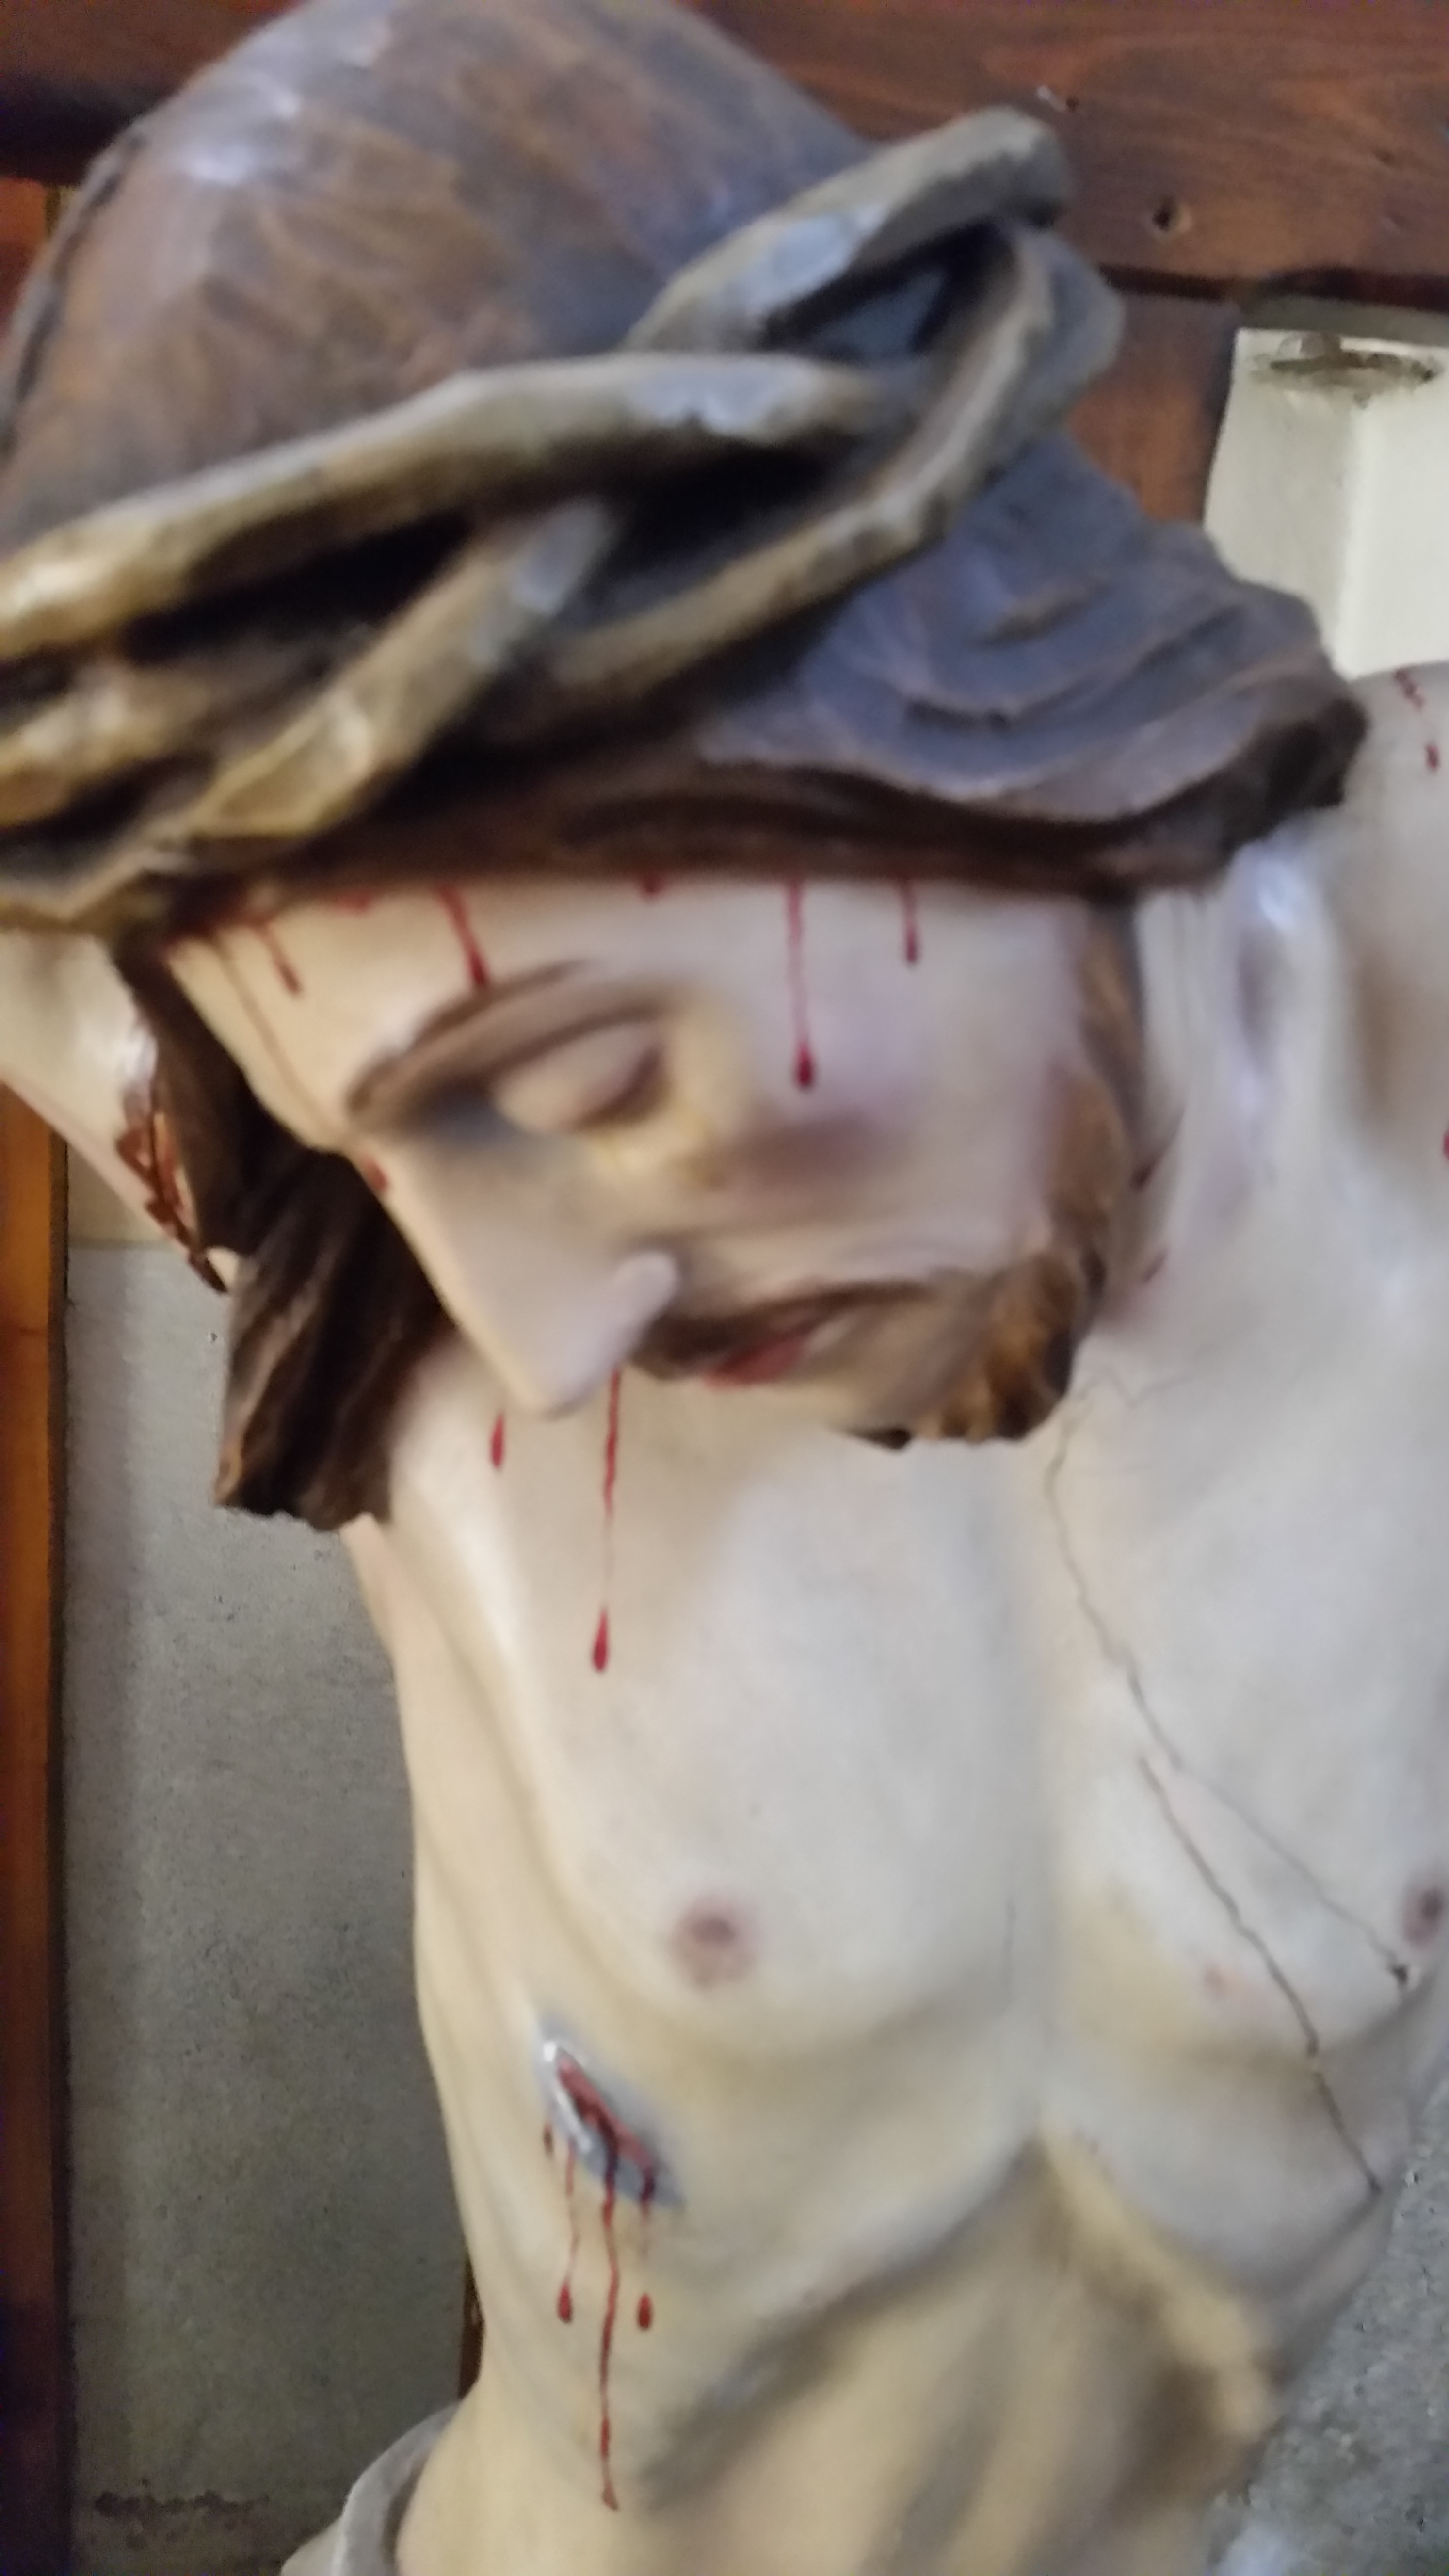 Leggiuno: deceduto frate Gabriele, dal 2019 all'eremo di Santa Caterina